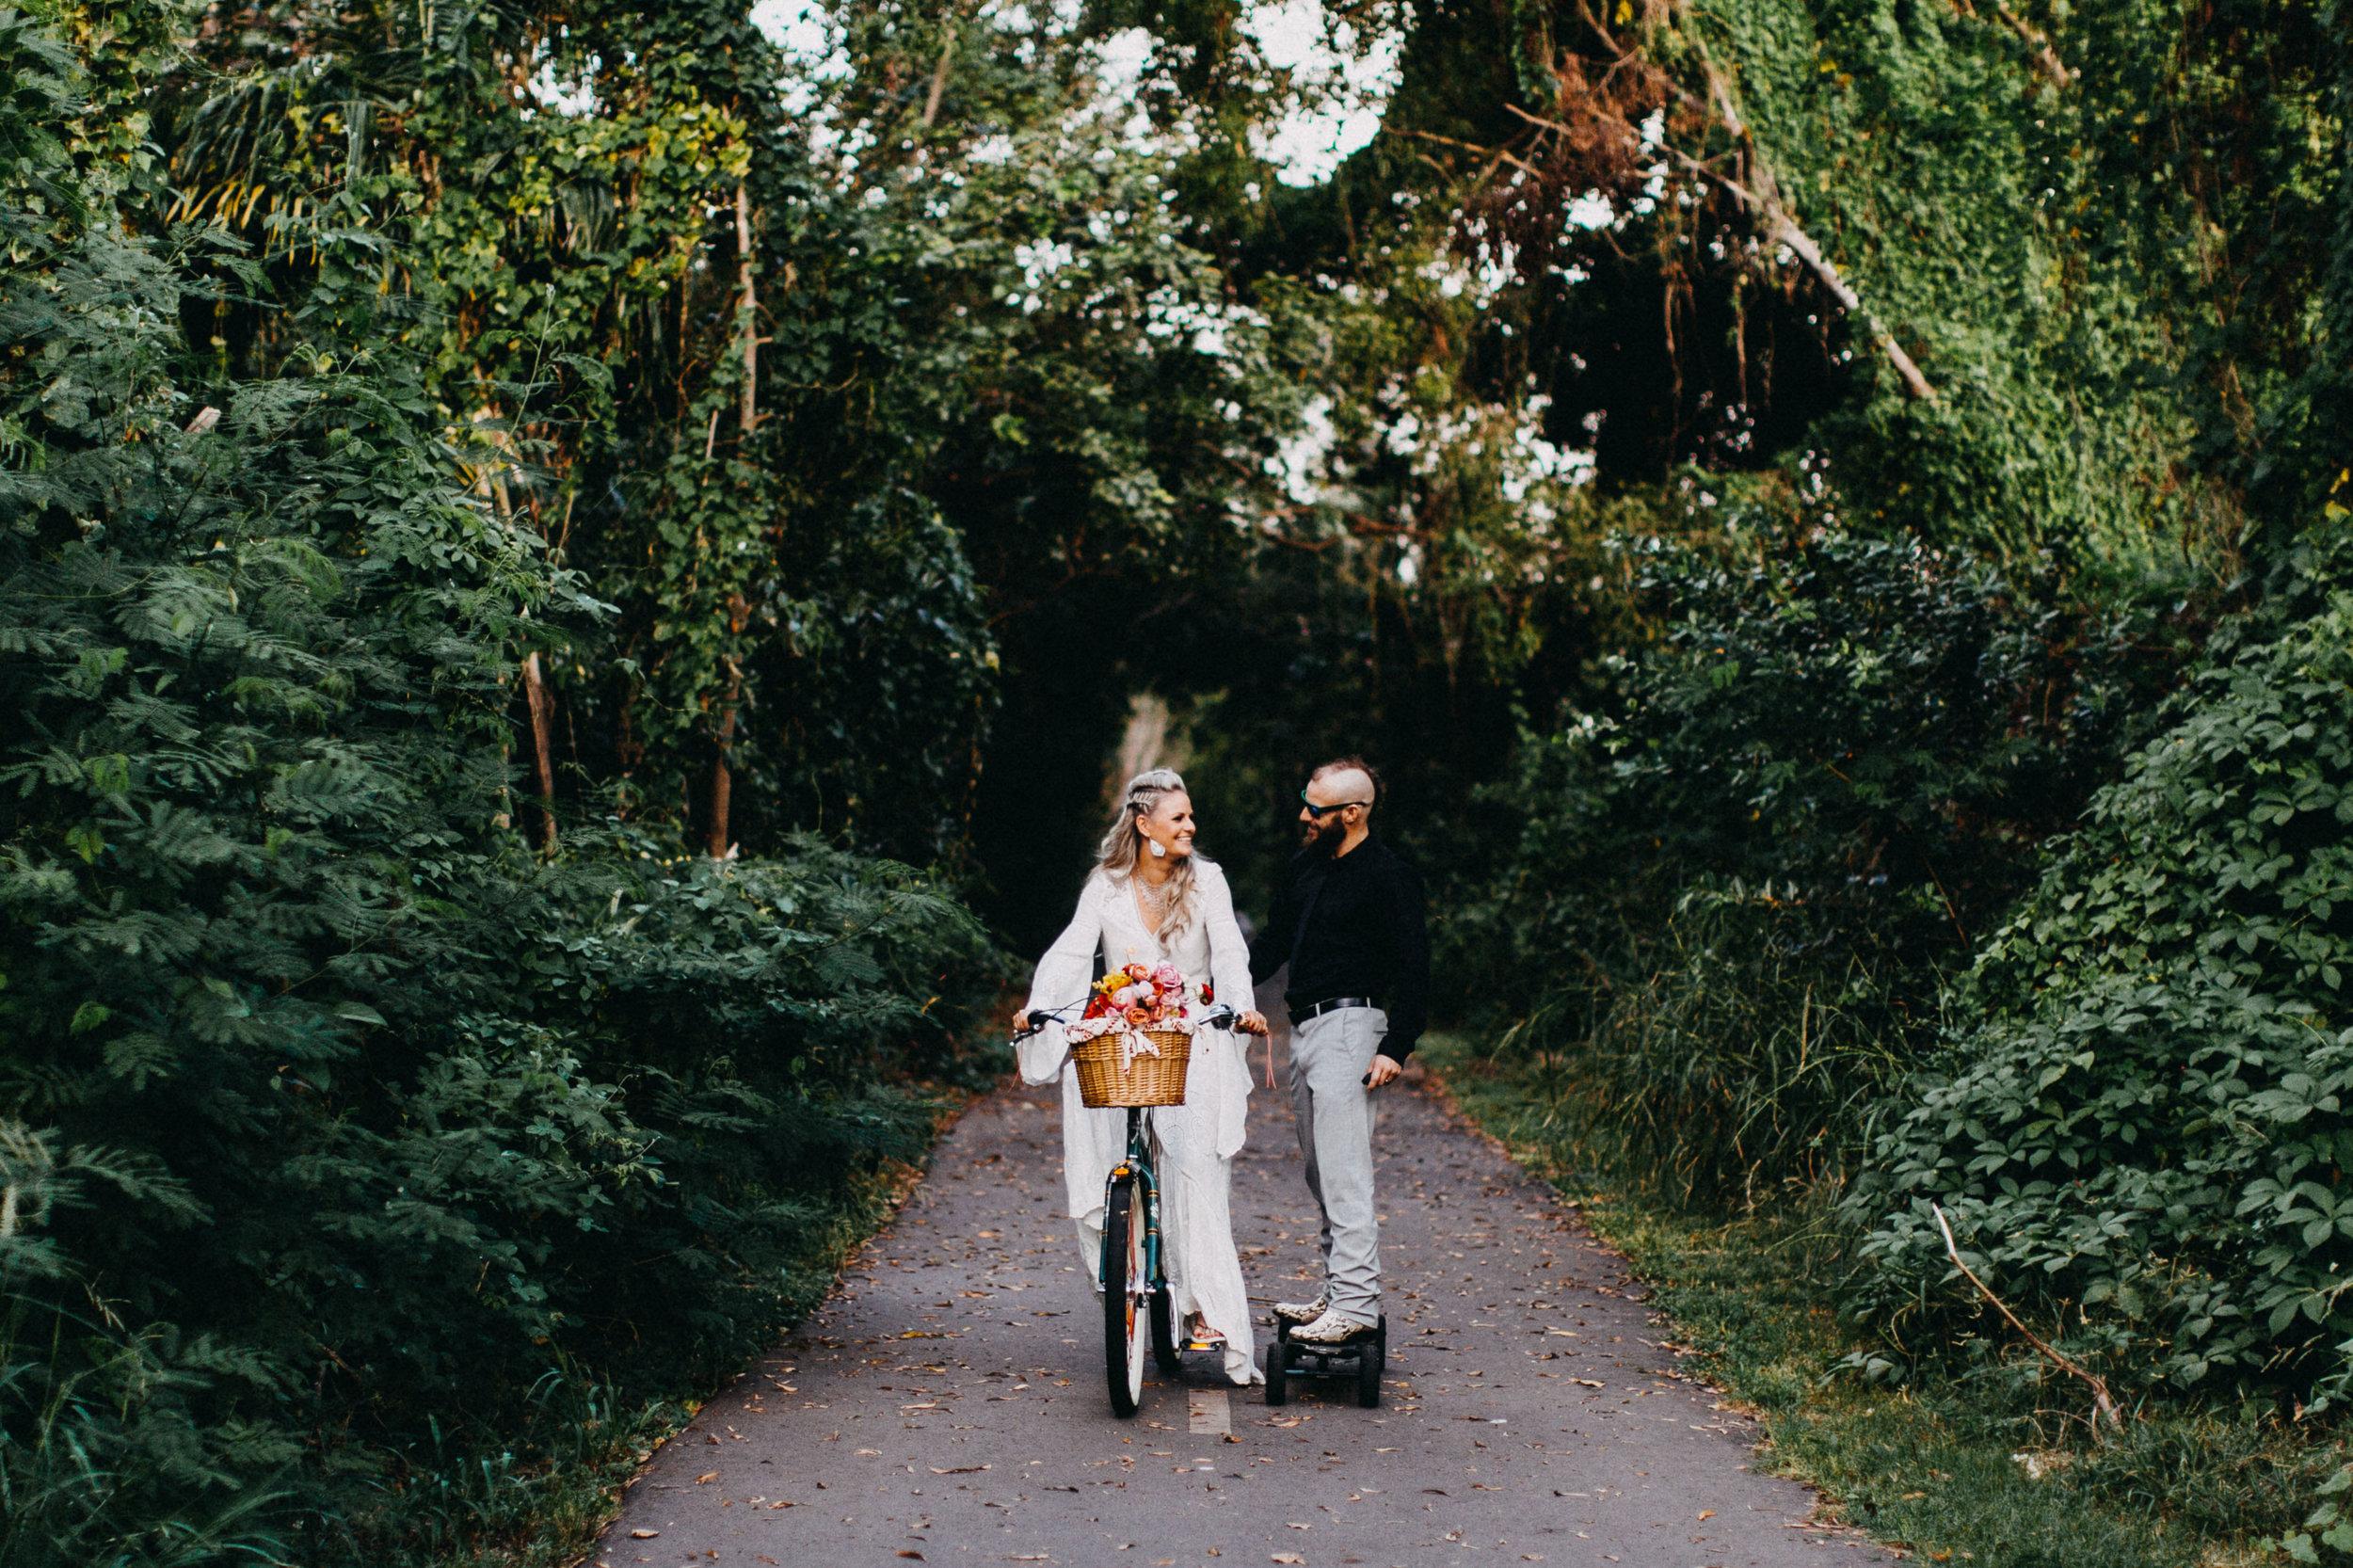 darwin-elopement-wedding-beach-camden-photography-www.emilyobrienphotography.net-49.jpg